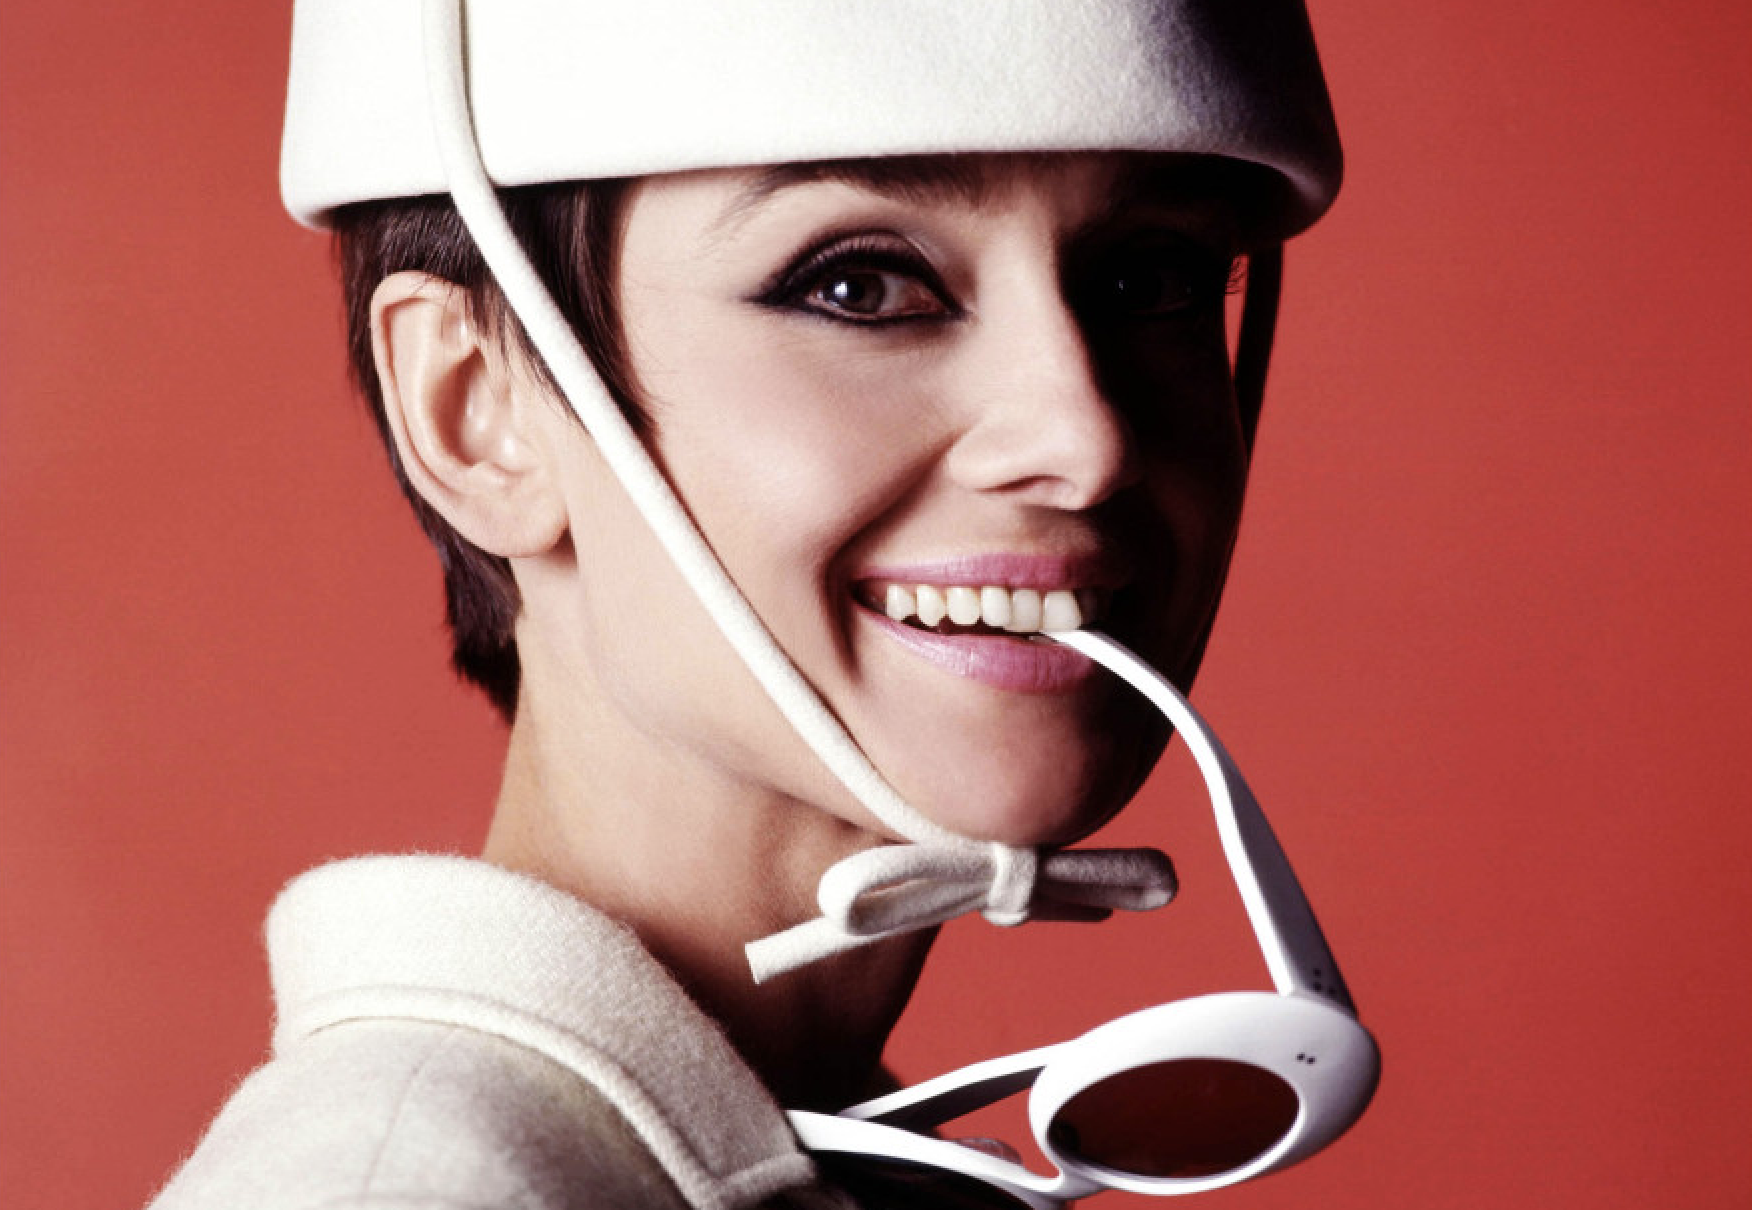 Audrey, splendido documentario nell'offerta streaming Best of di CHILI